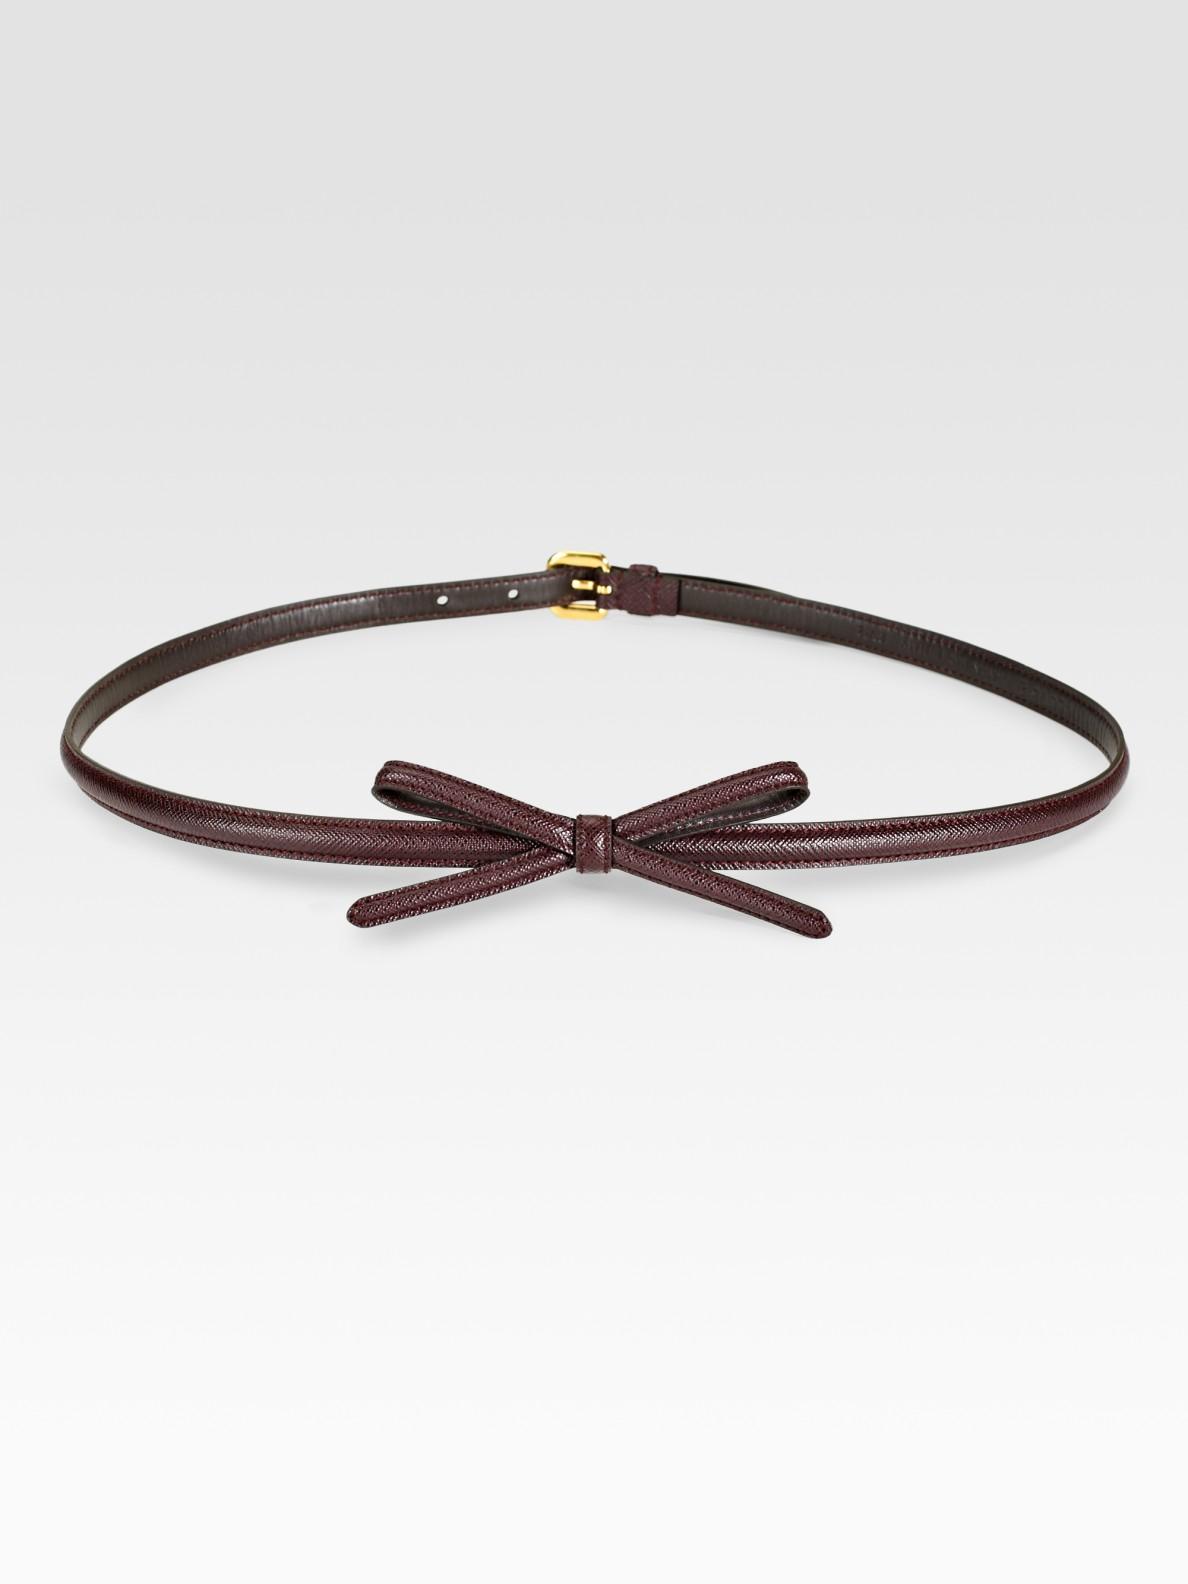 Prada Saffiano Leather Bow Belt in Purple (bordeaux) | Lyst